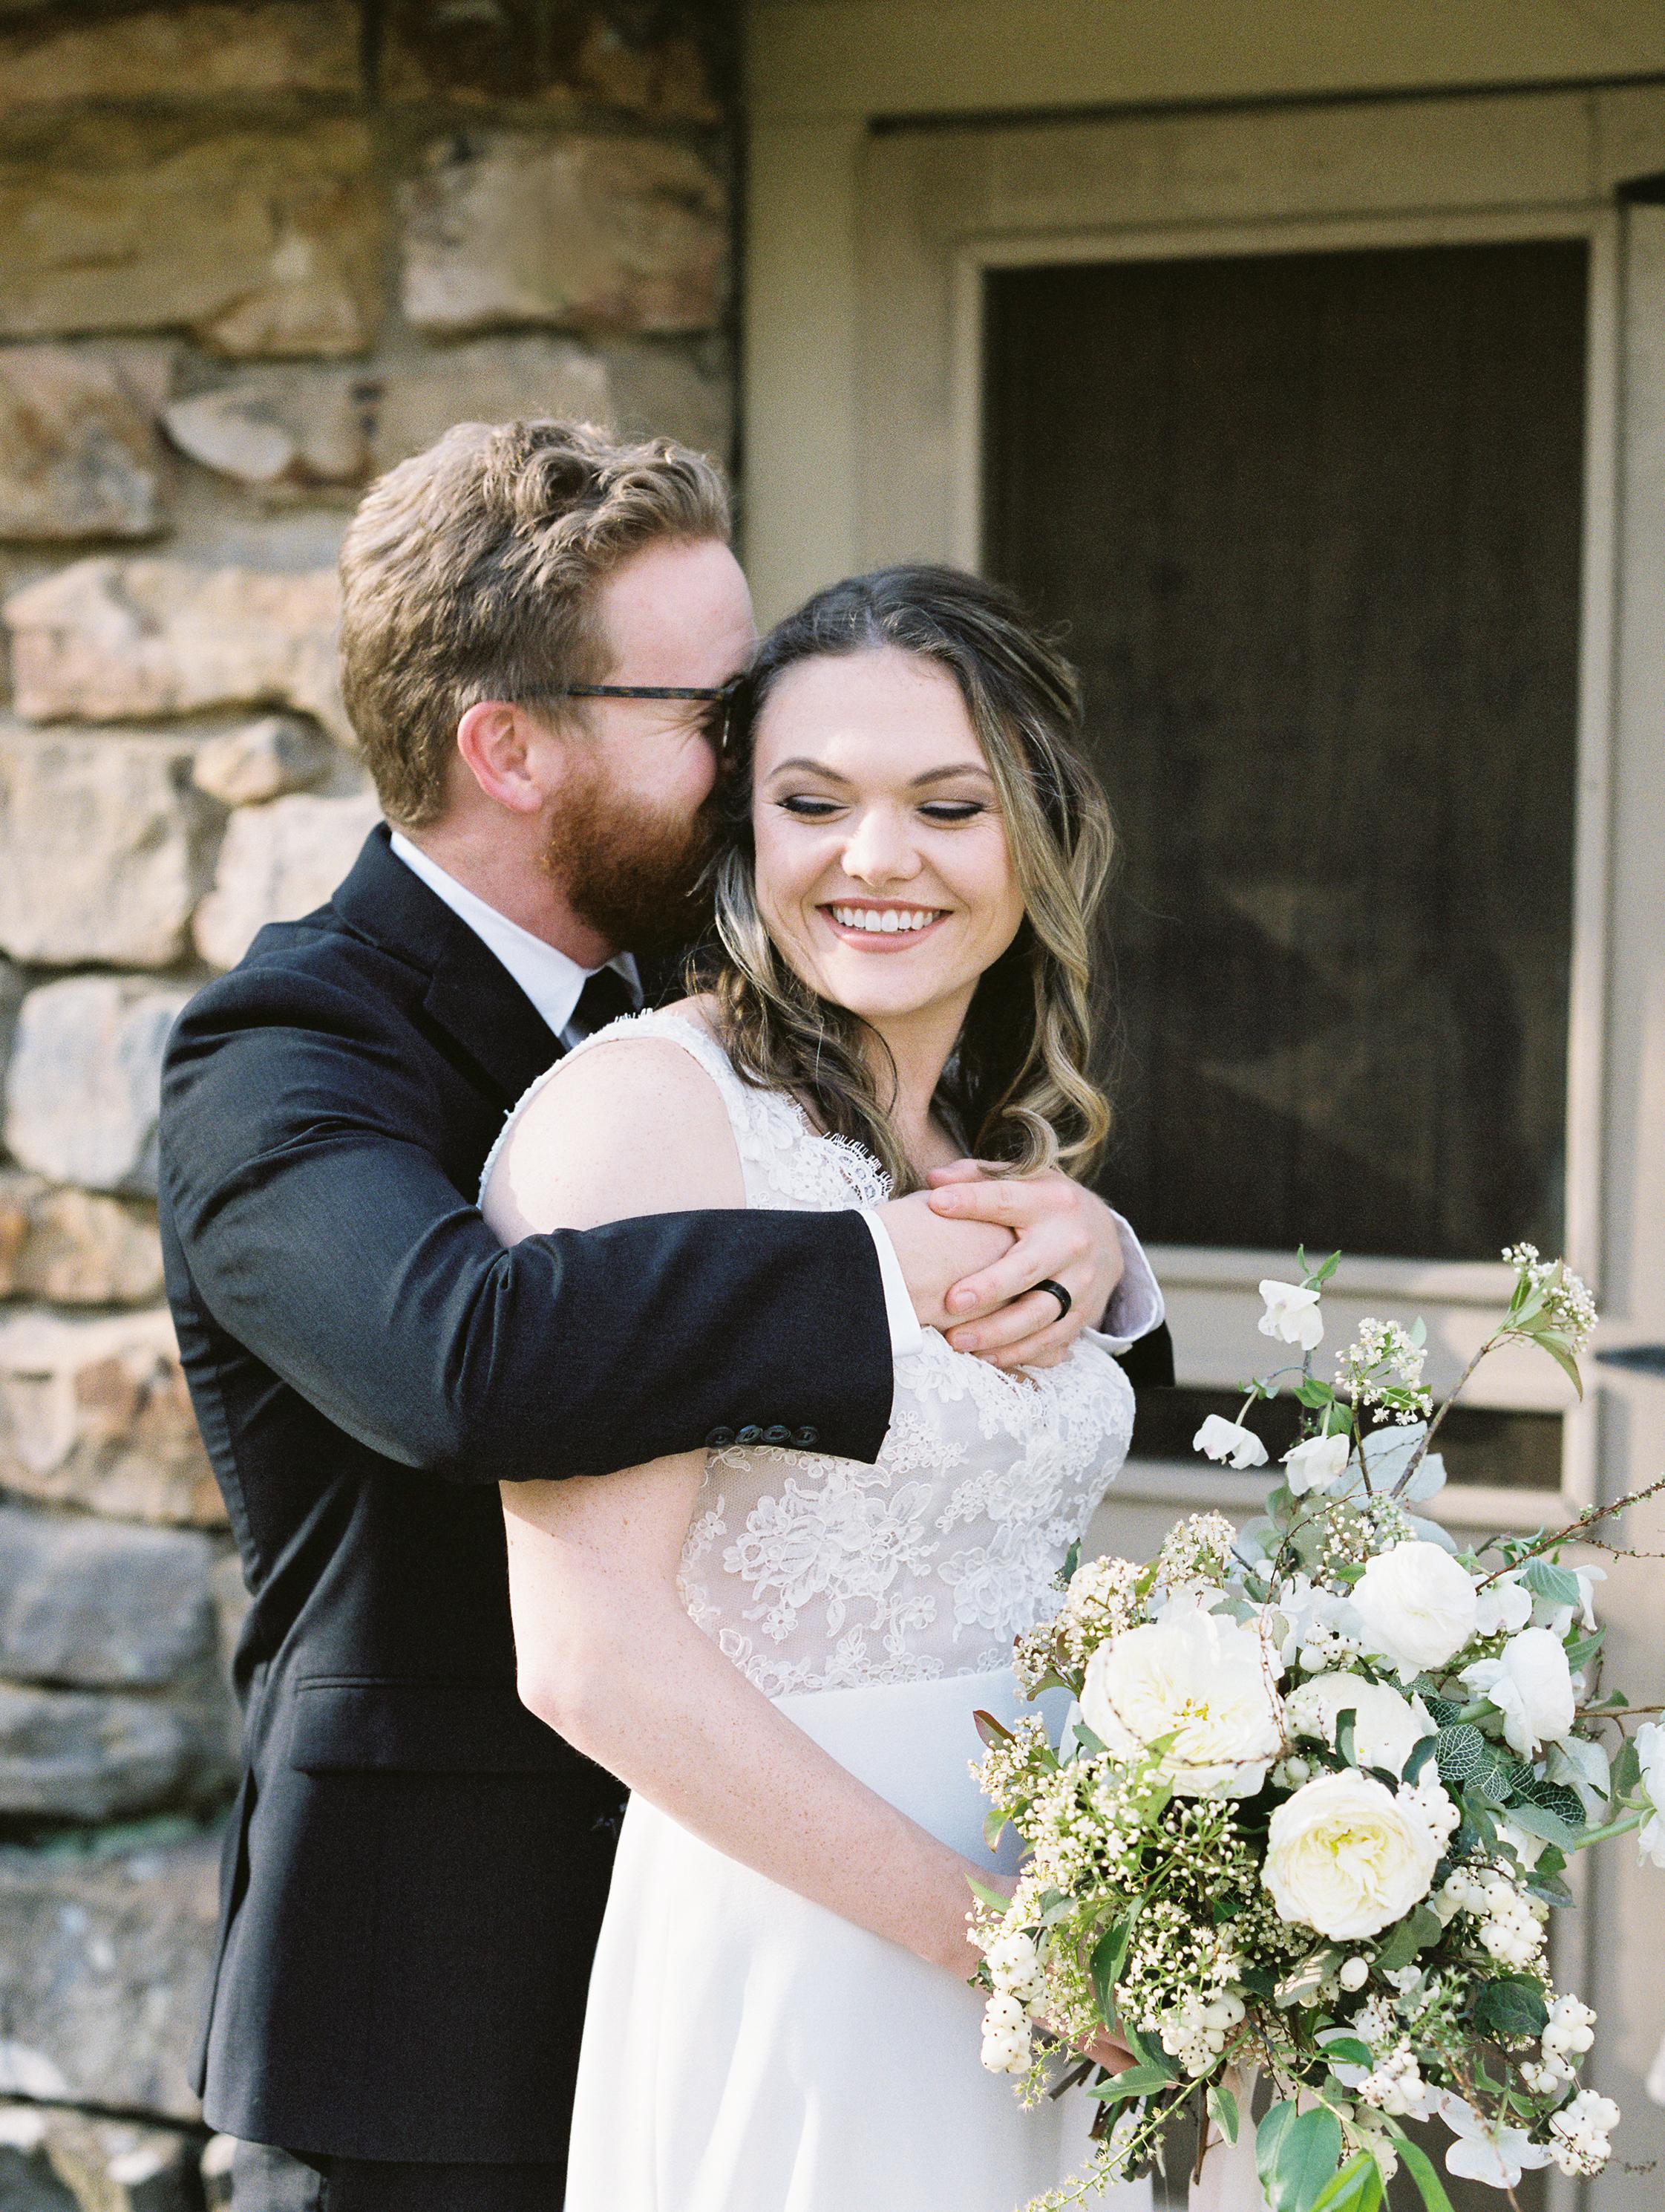 Huntsville-Alabama-Elopement-Intimate-Wedding-Film-Photographer-113.jpg